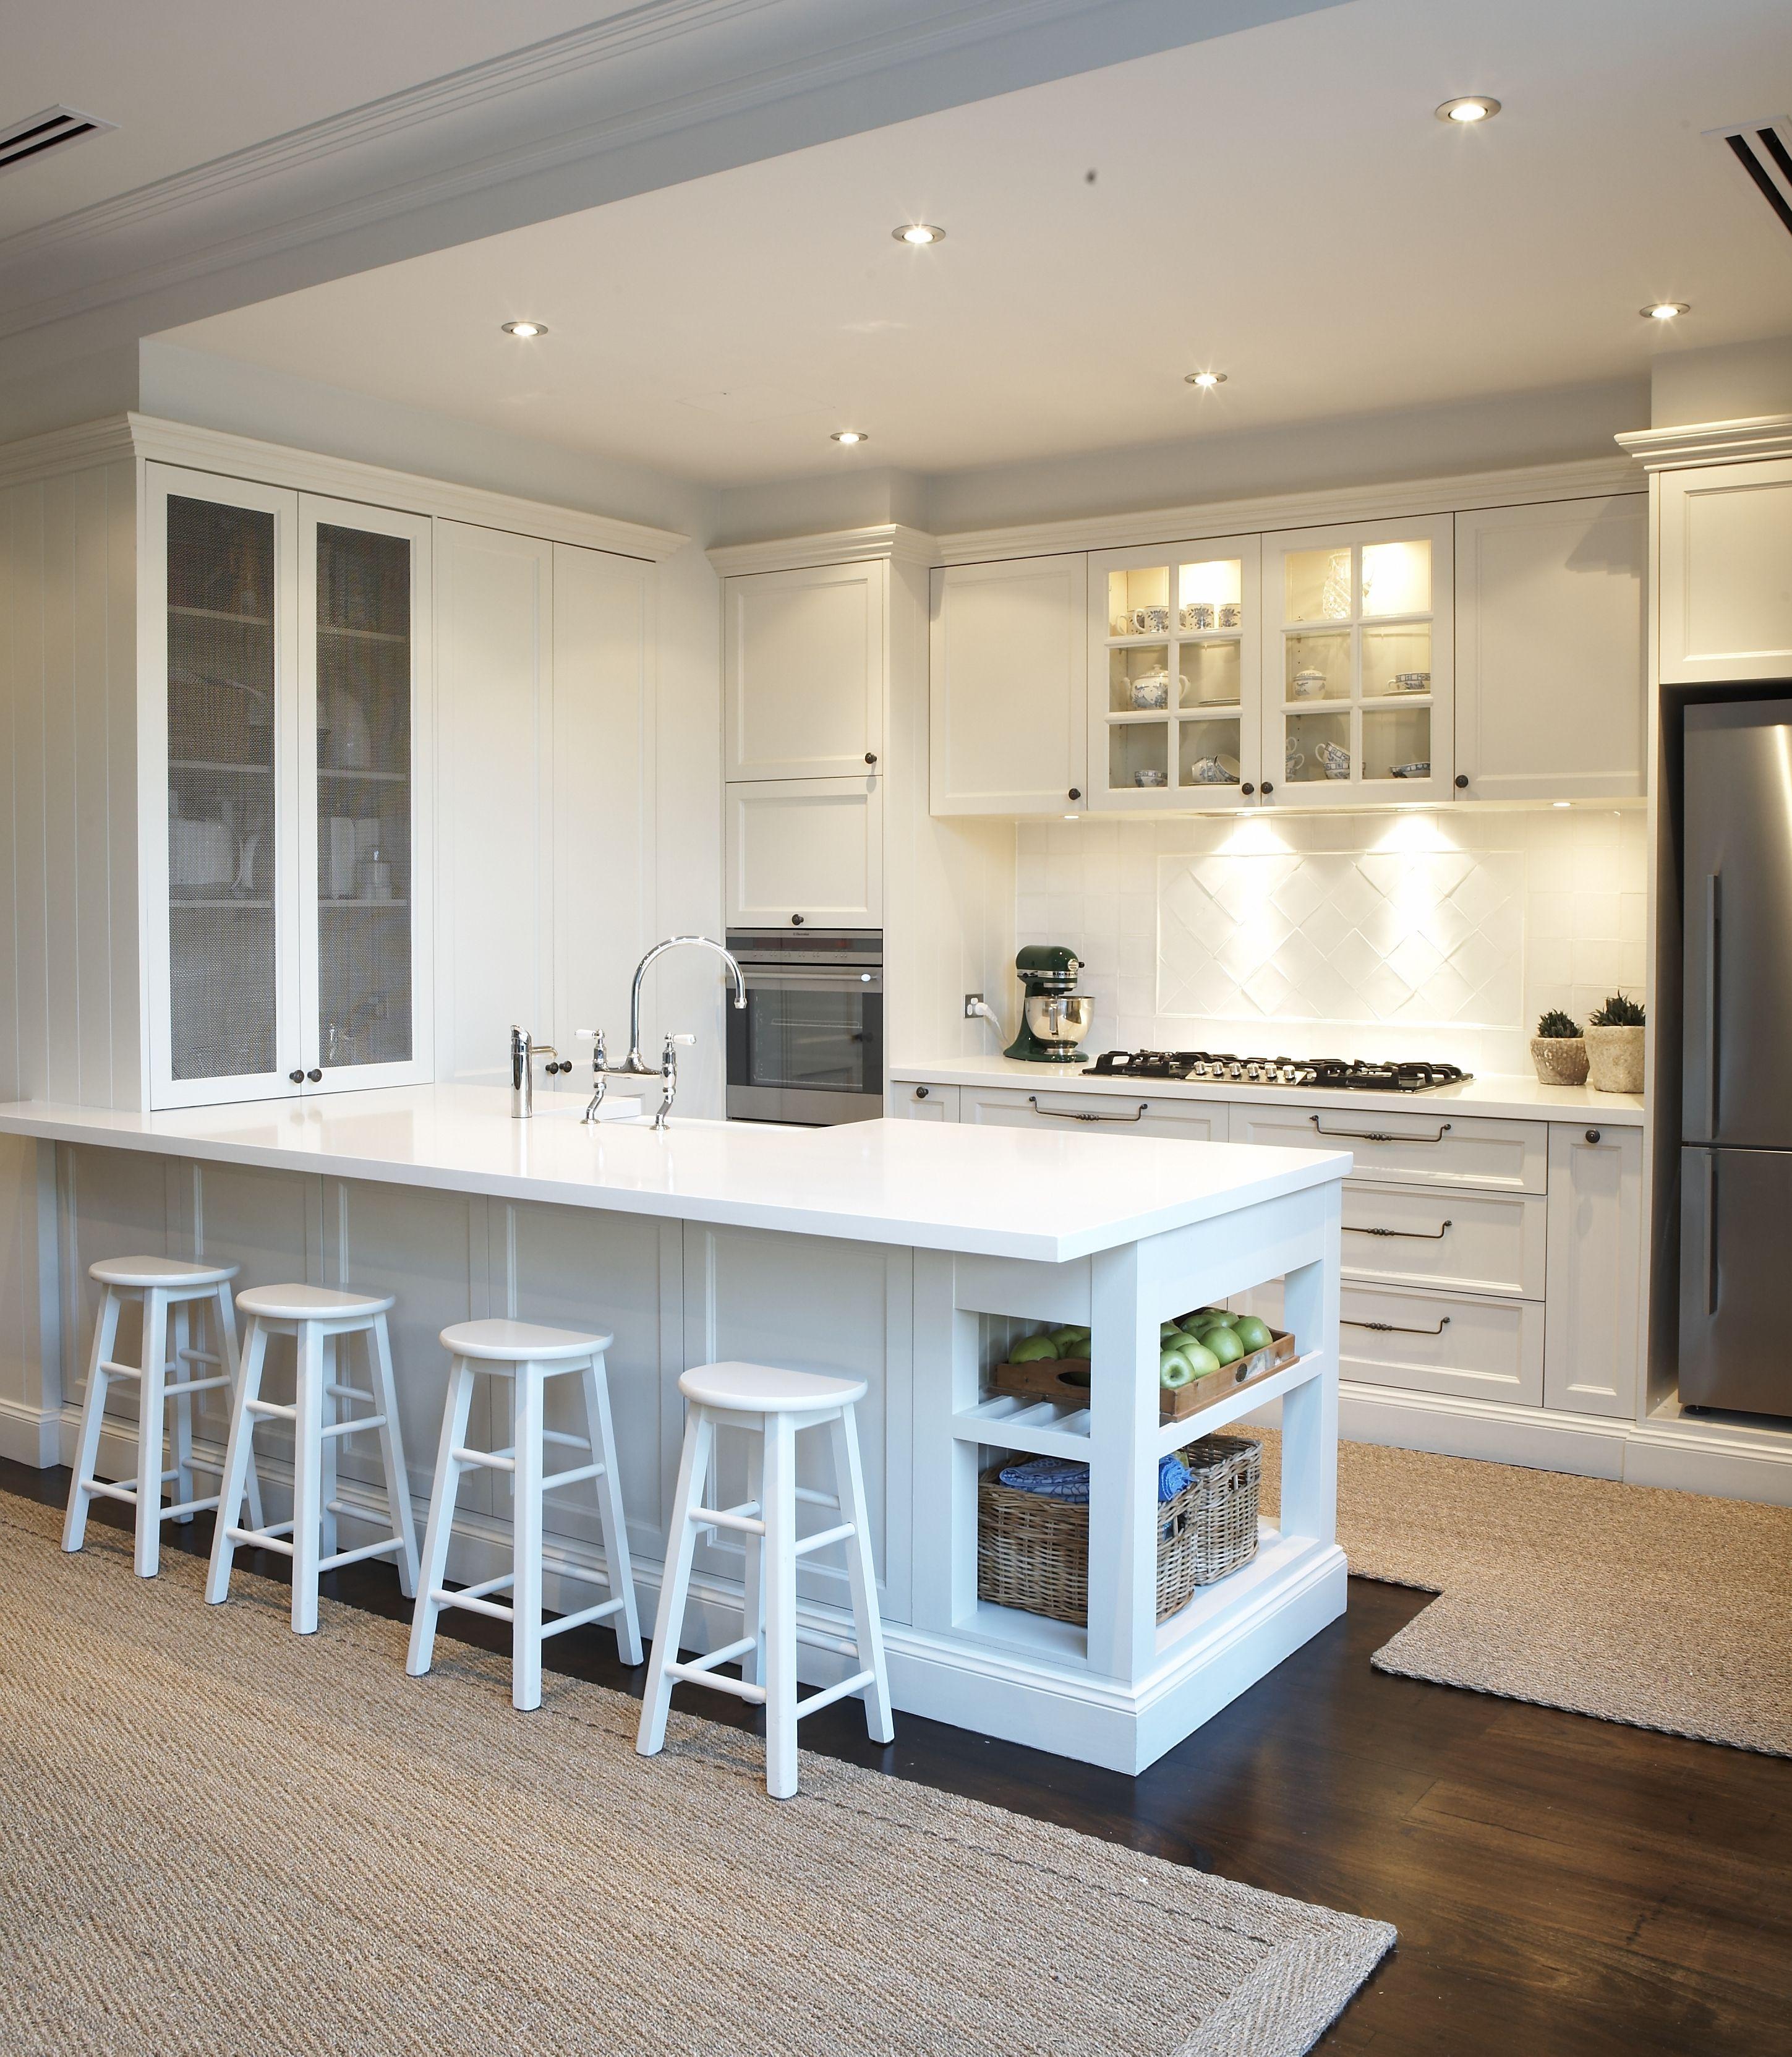 Provincial Kitchen, provincial, white, bar stools